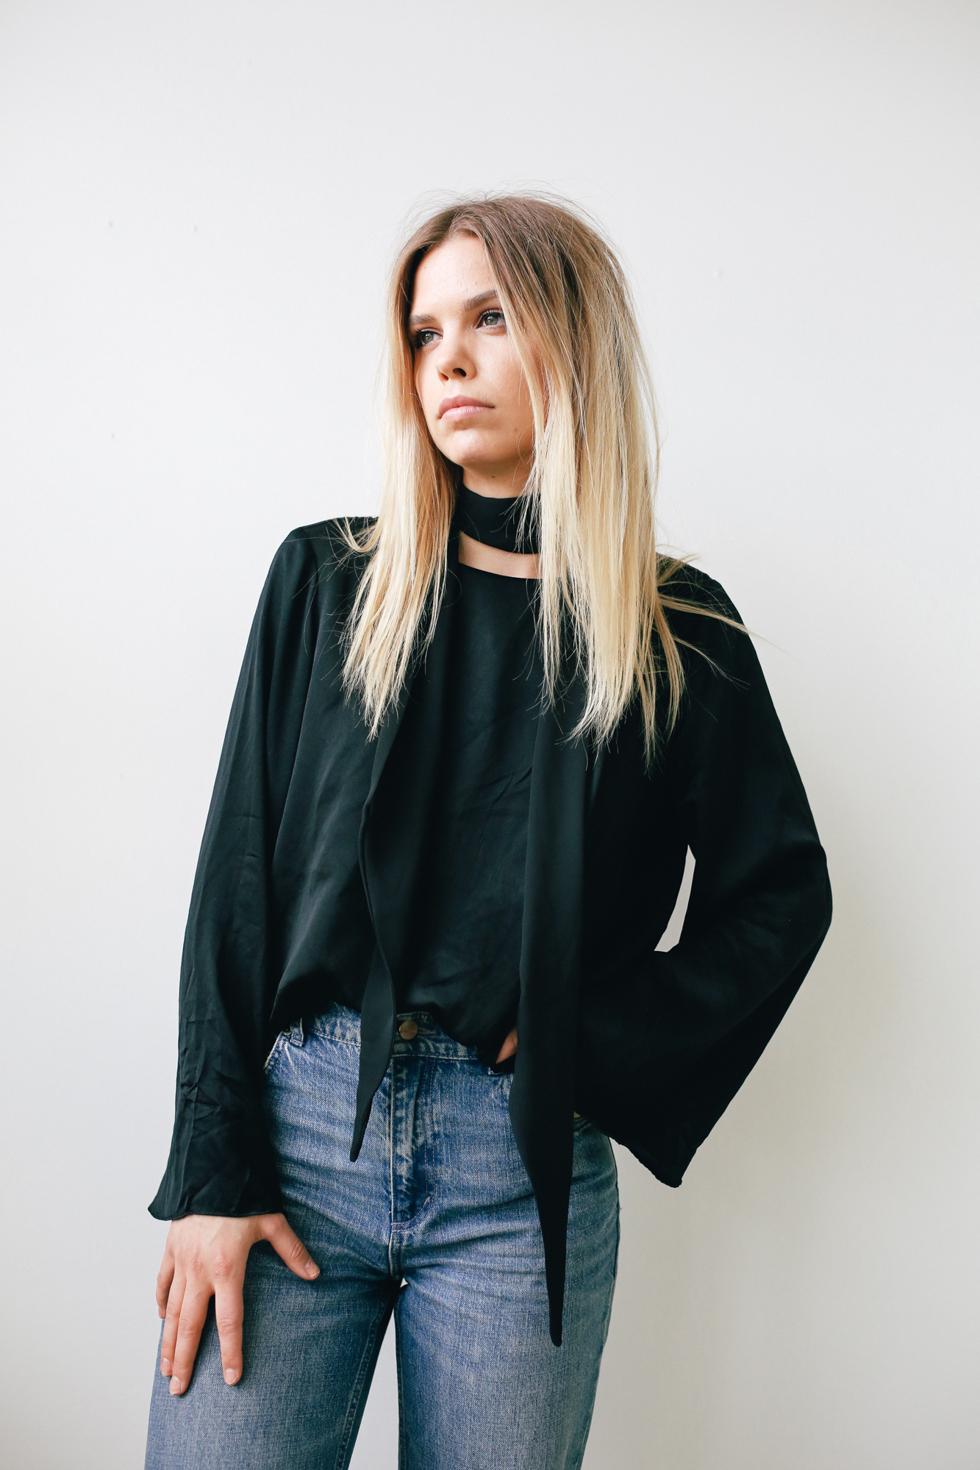 Flora Wiström, florasblogg.se, @florawis - scarf, silke blouse, bell sleeve, frayed jeans